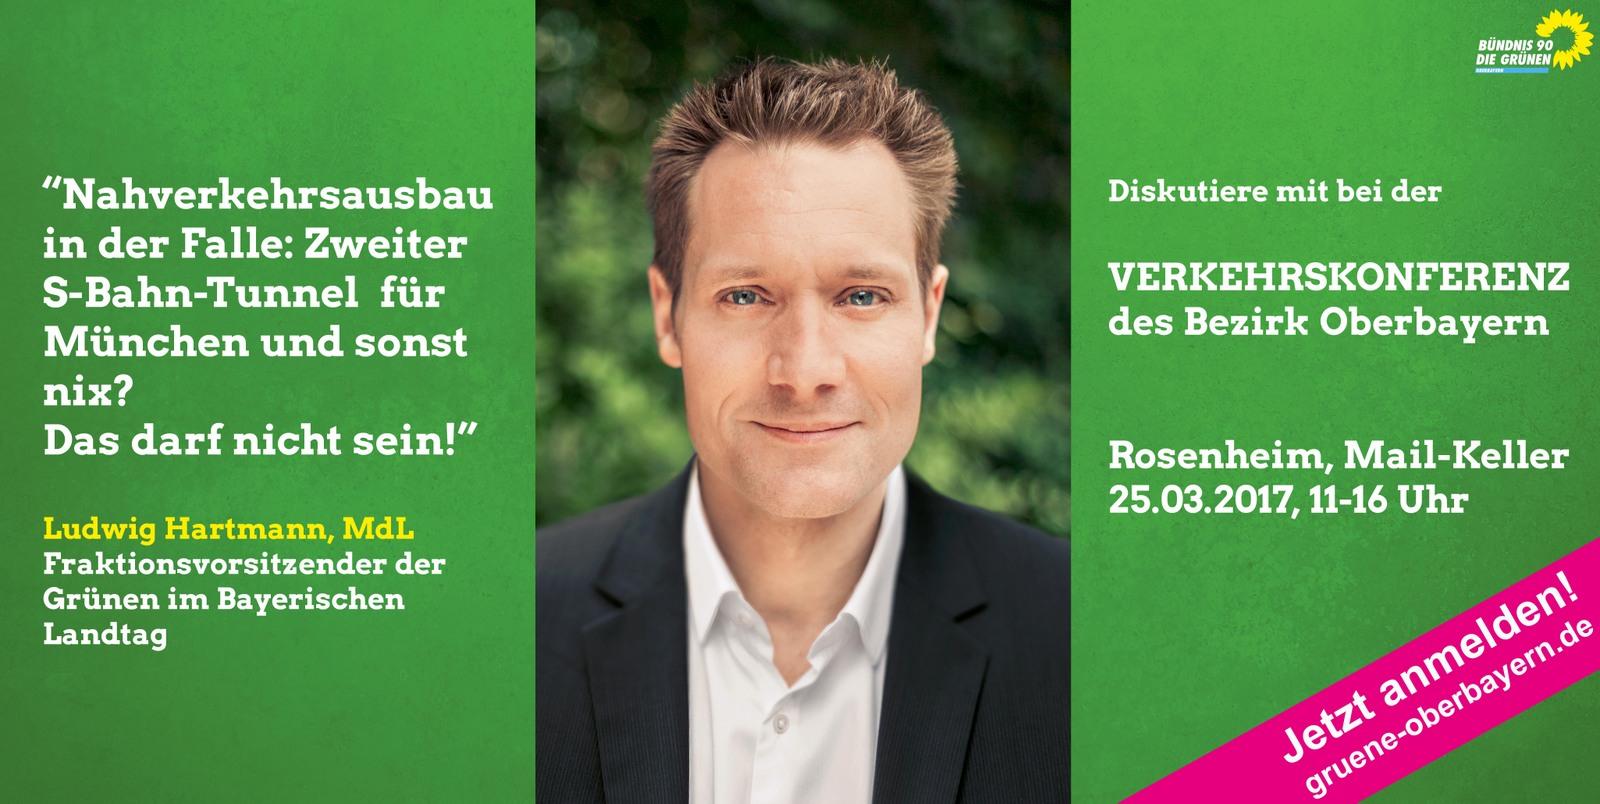 http://gruene-oberbayern.de/wp-content/uploads/2017/03/SharepicVerkehr_Ludwig-klein.jpg